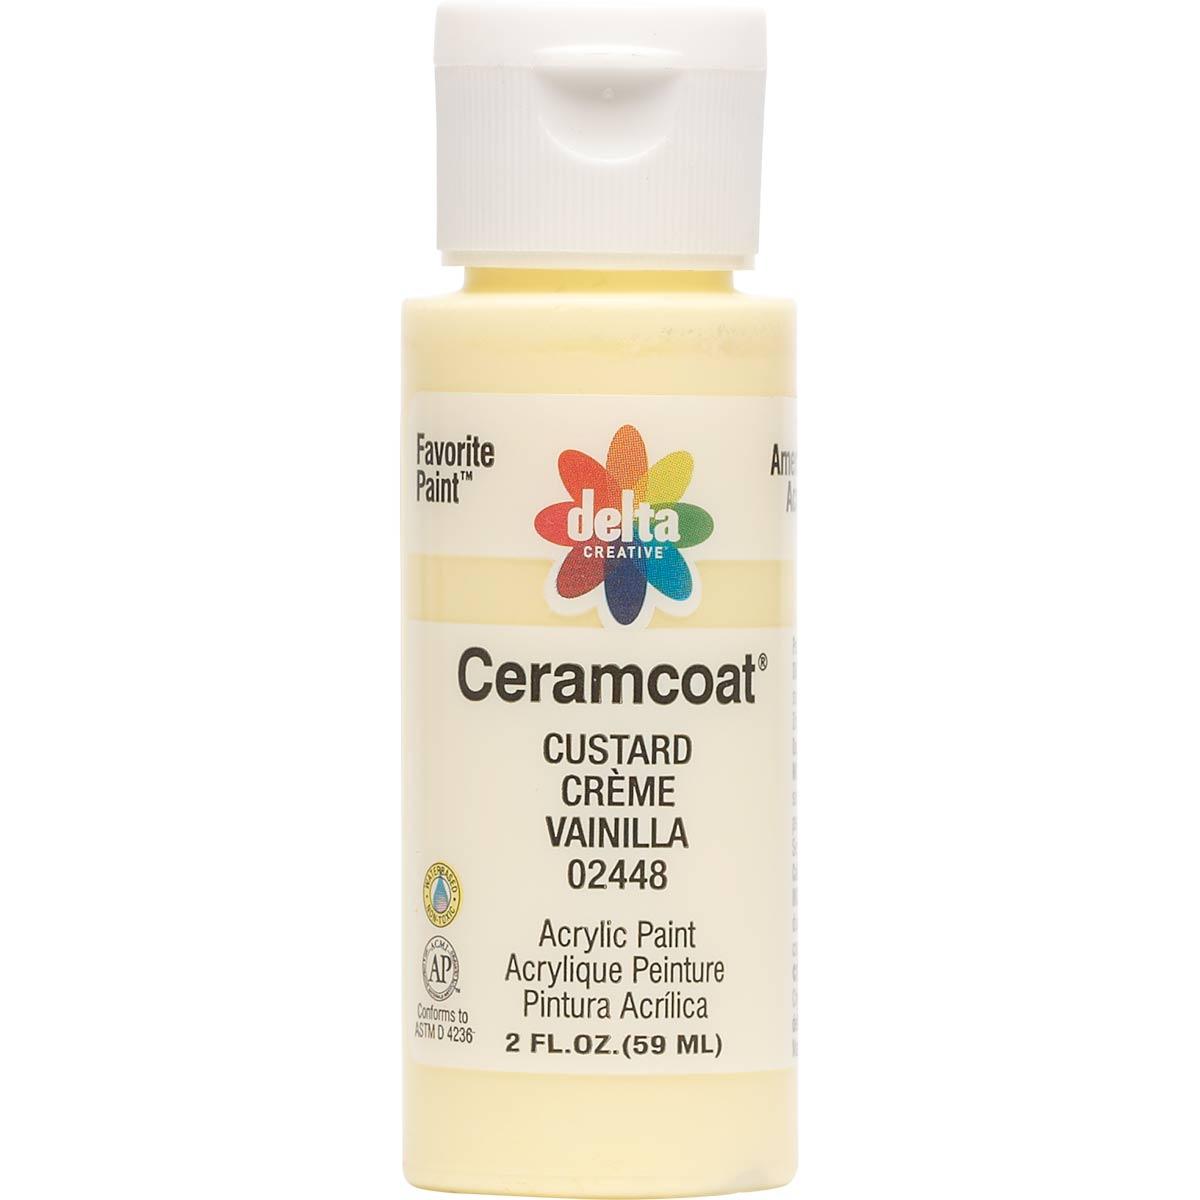 Delta Ceramcoat ® Acrylic Paint - Custard, 2 oz. - 024480202W